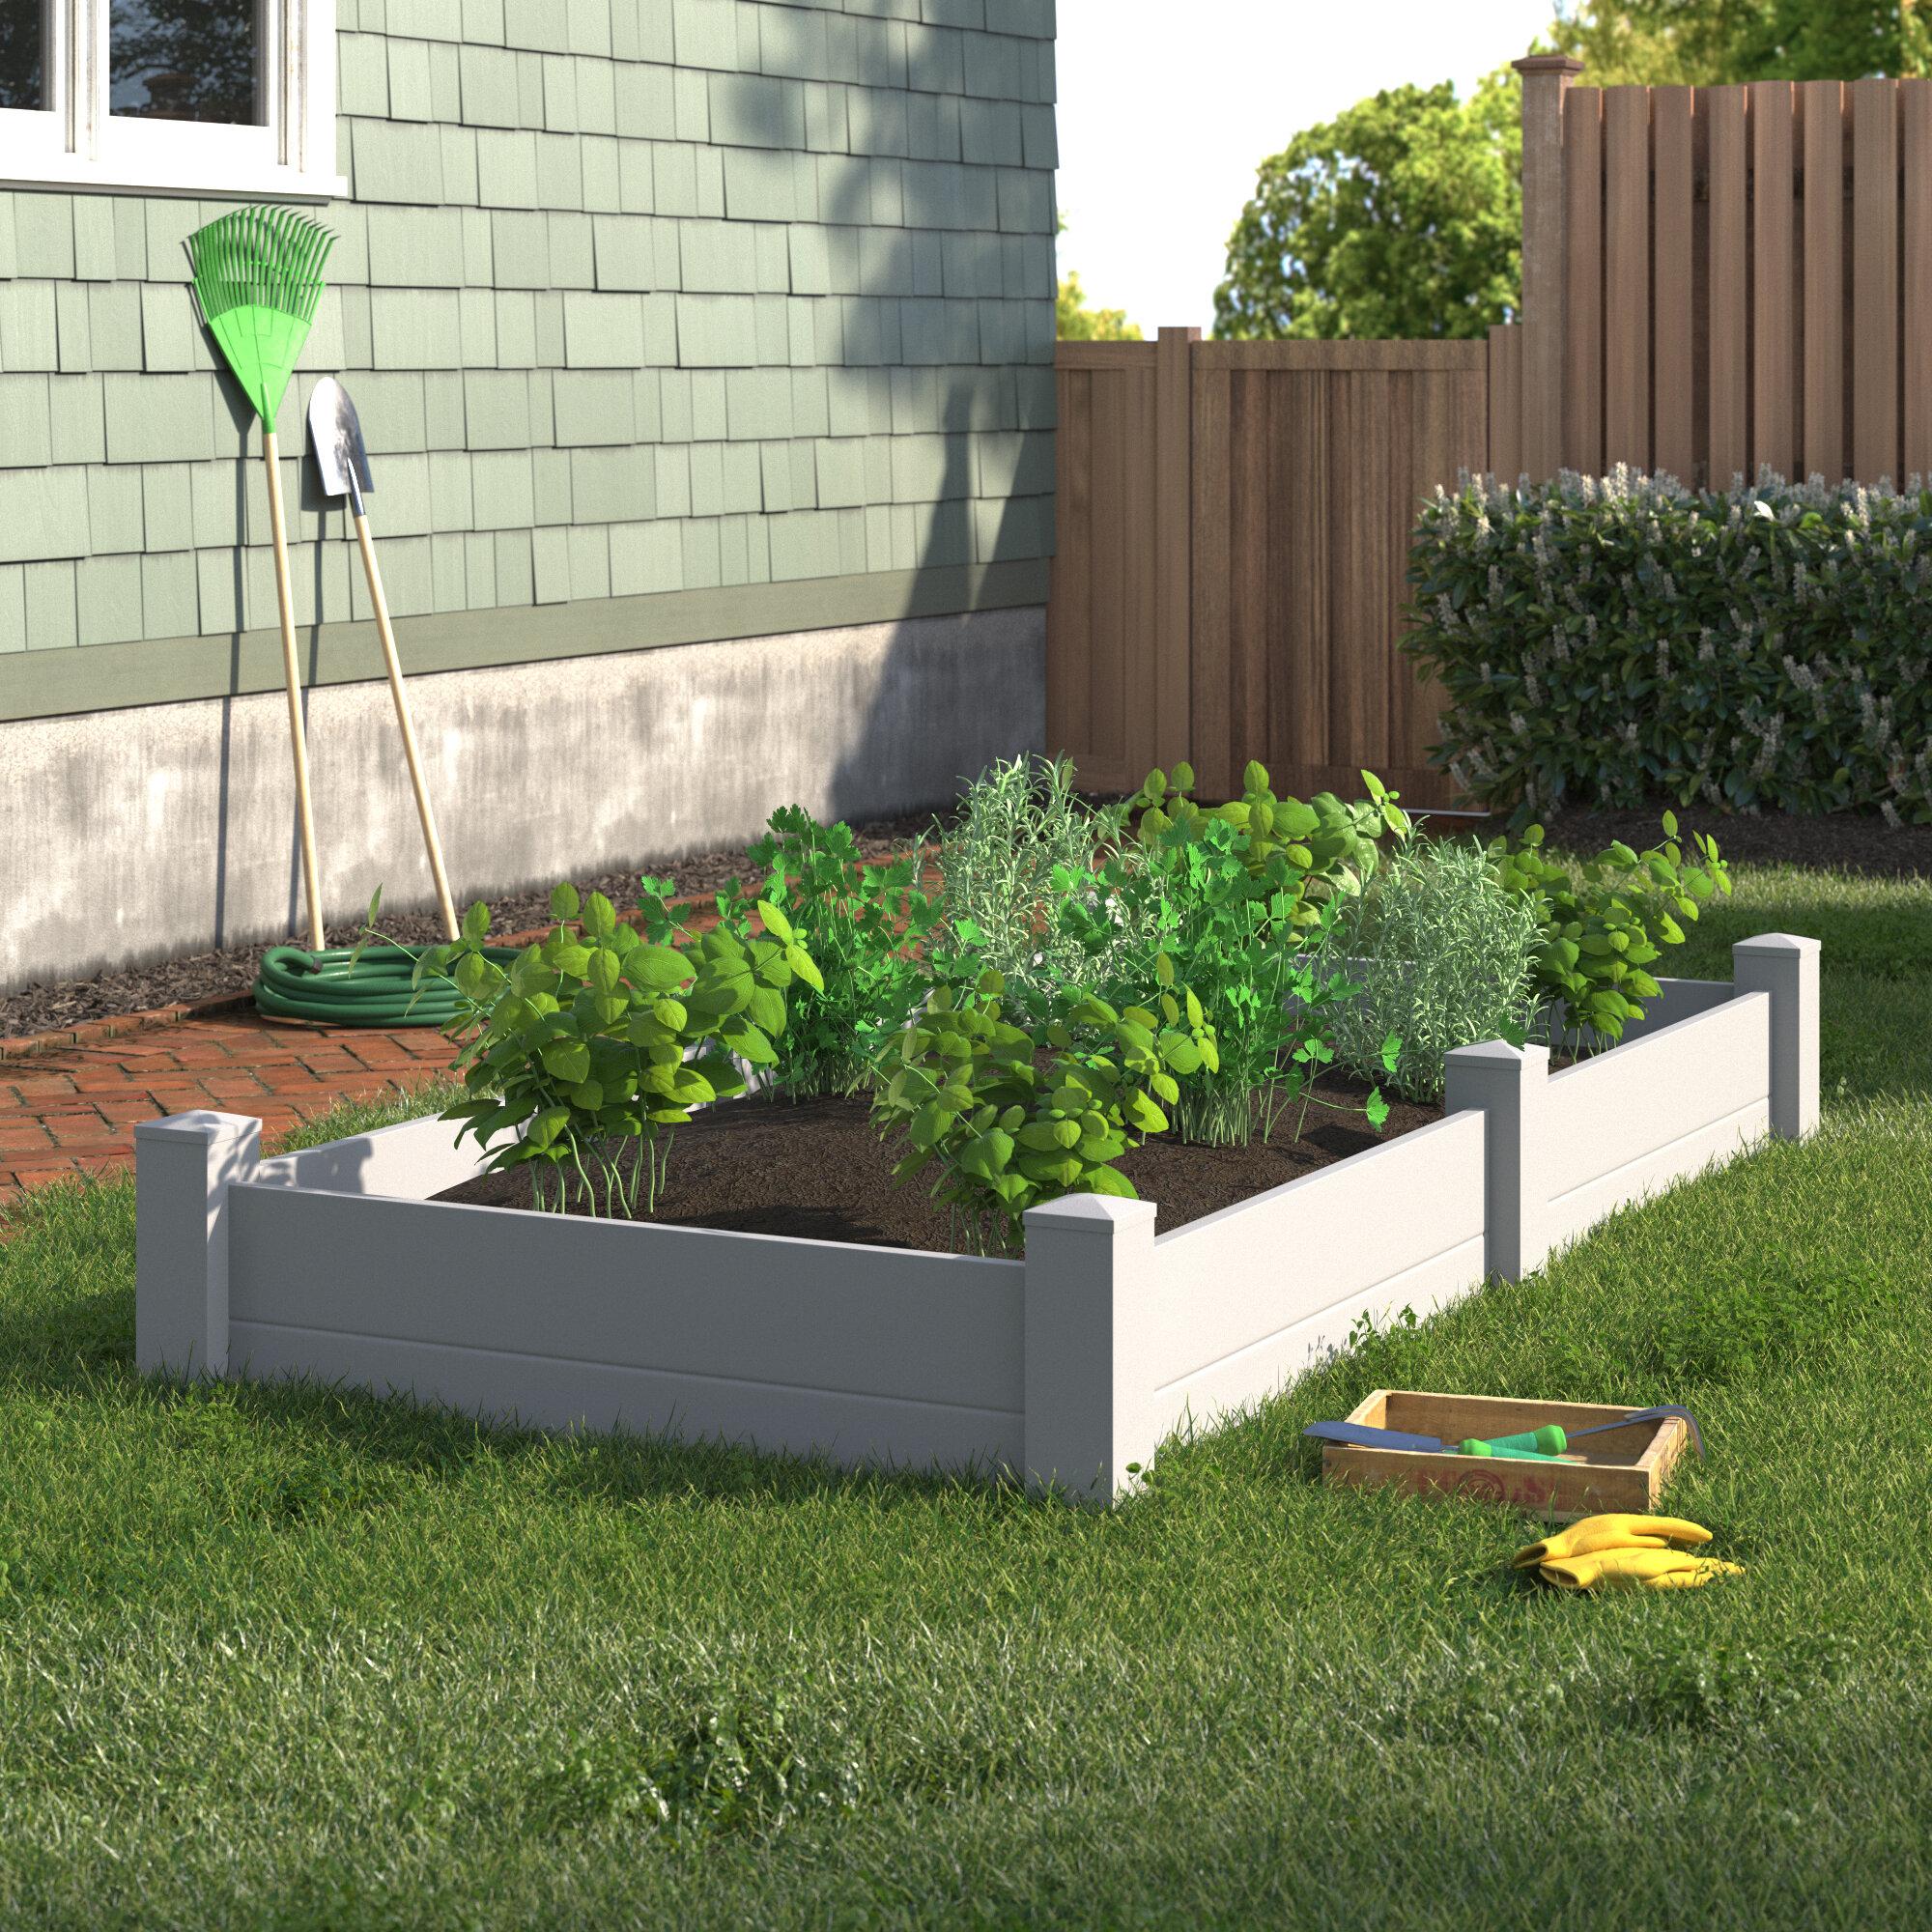 Plastic Raised Garden Planters You Ll Love In 2020 Wayfair